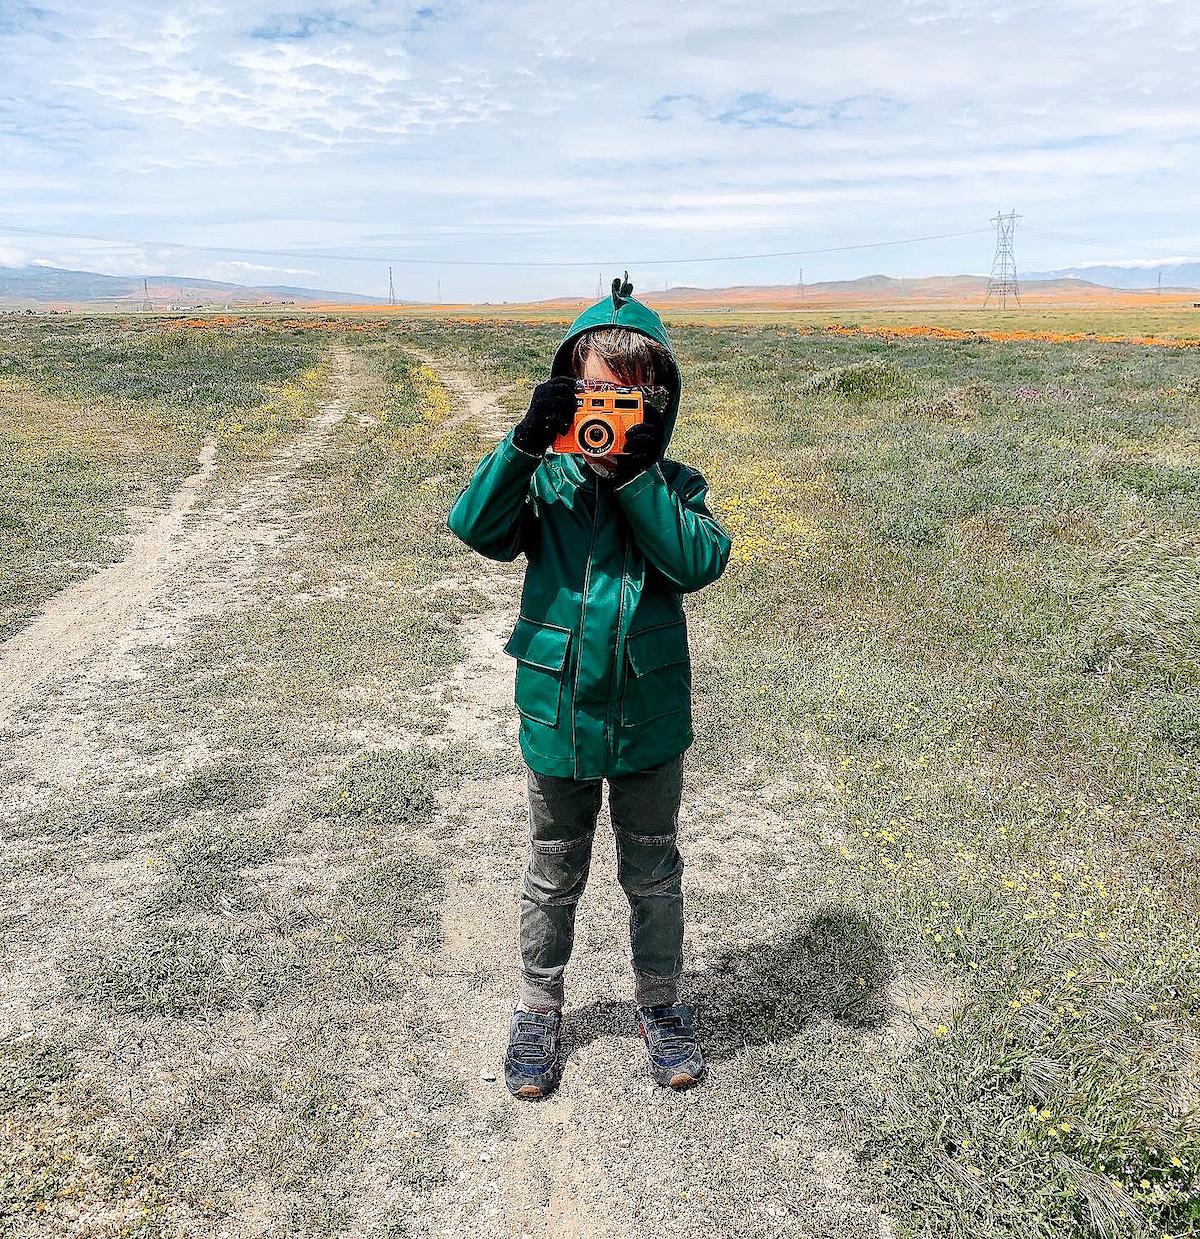 Little boy in field holding up camera